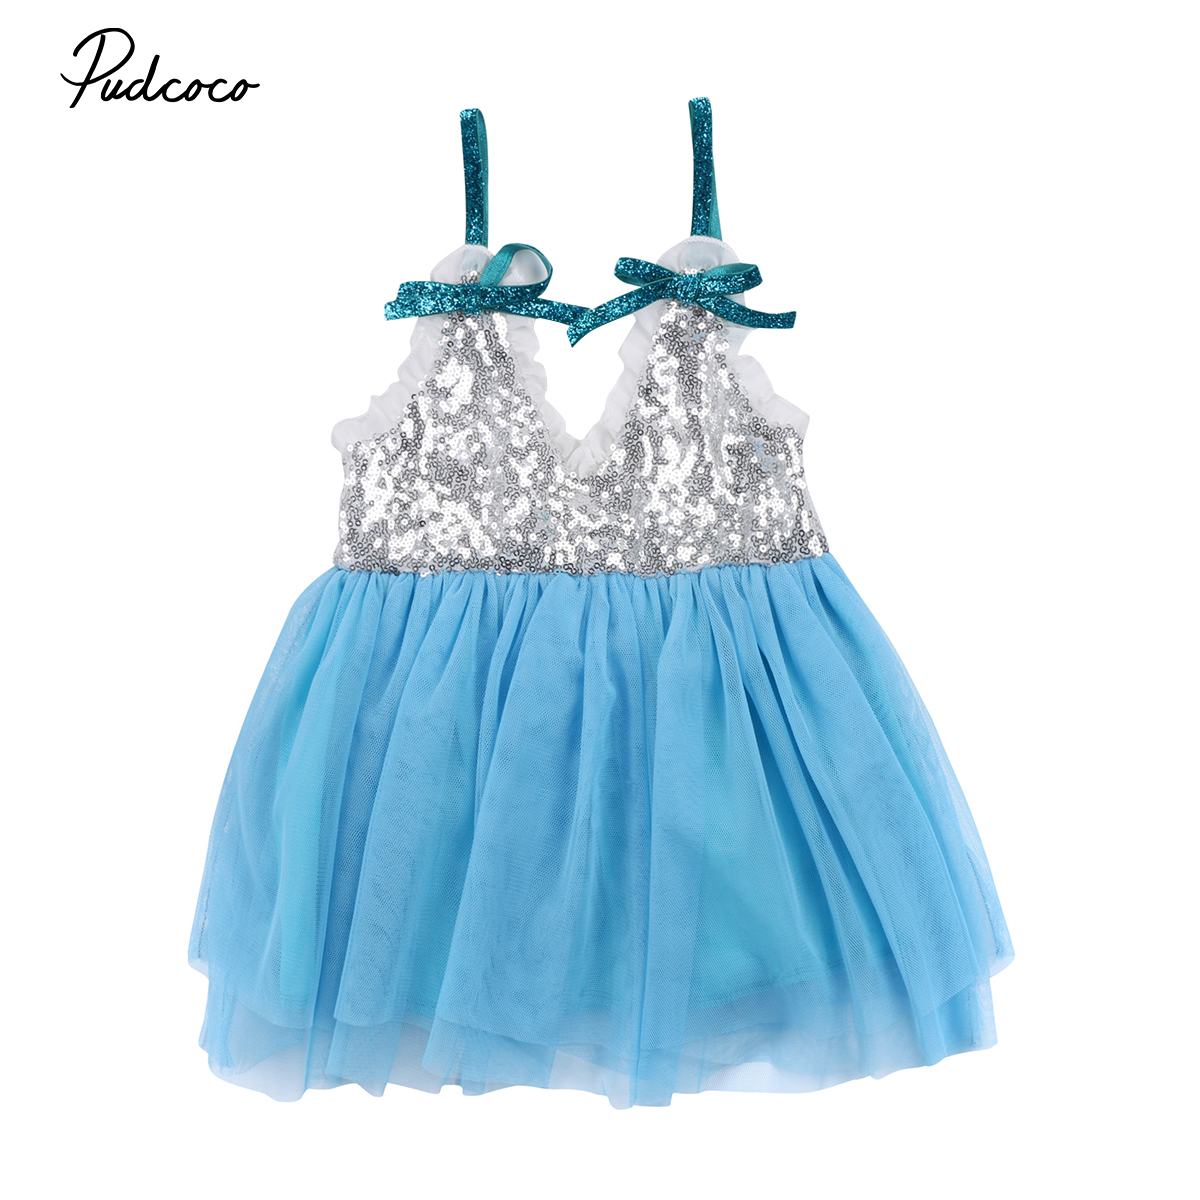 2018 New Princess Girls dress Kids Baby Girls Sequin blue Tulle ...